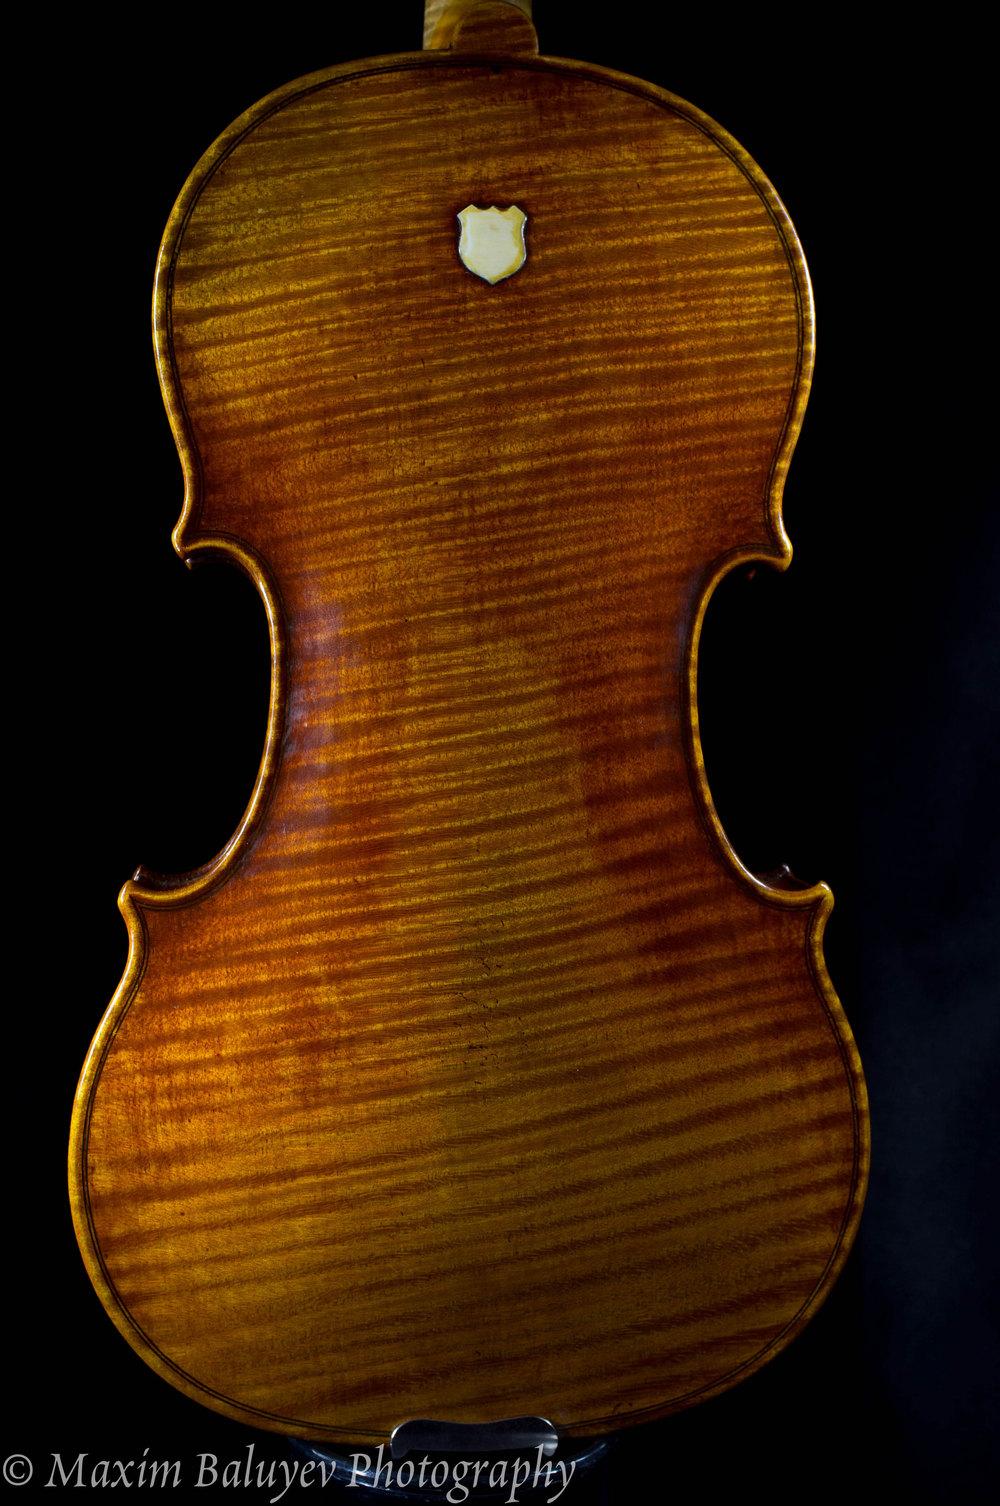 Ernst Heinrich Roth violin 1930 Stradivari 1725 copy